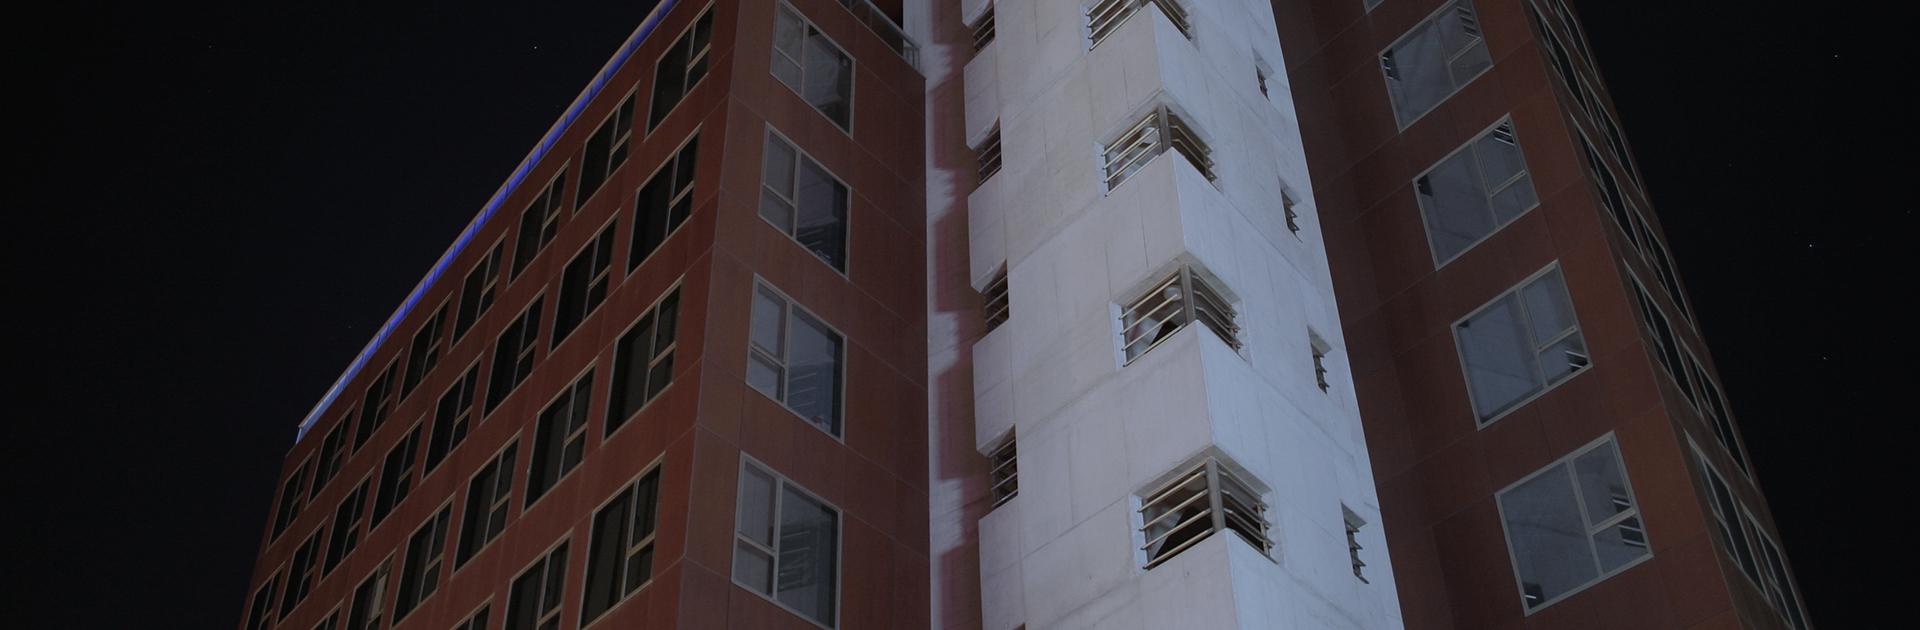 Edificio con oficinas para alquilar